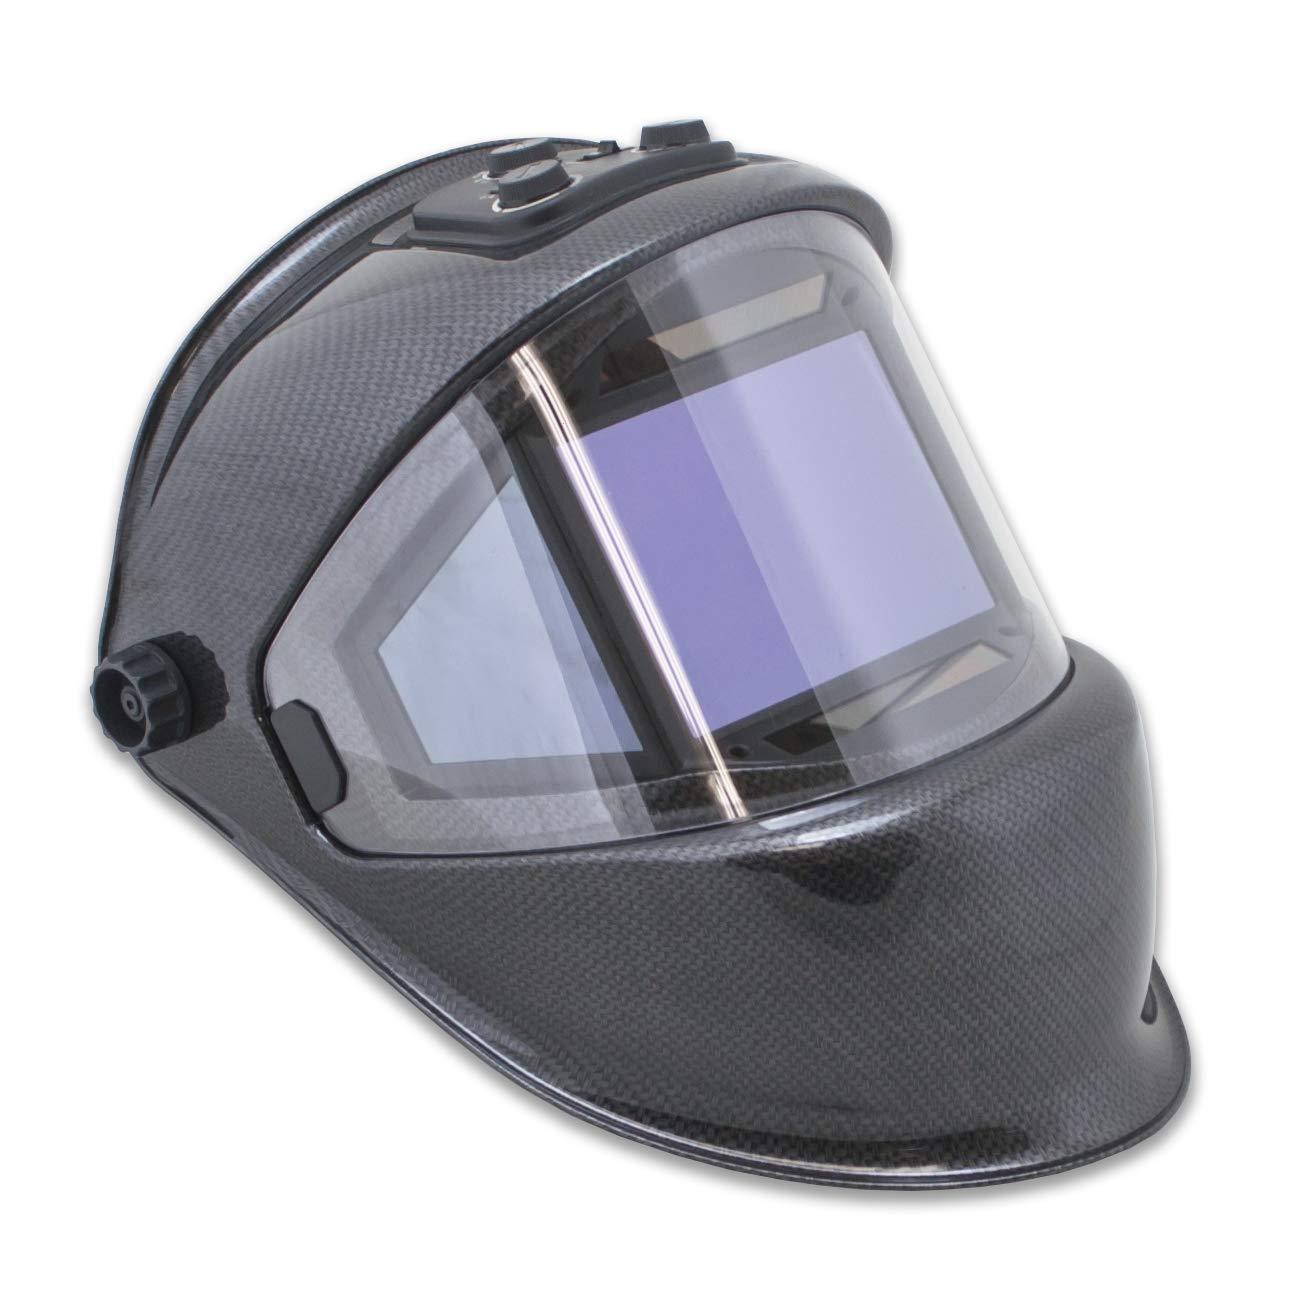 TGR Panoramic 180 View Solar Powered Auto Darkening Welding Helmet - True Color (CARBON FIBER) by Tool Guy Republic